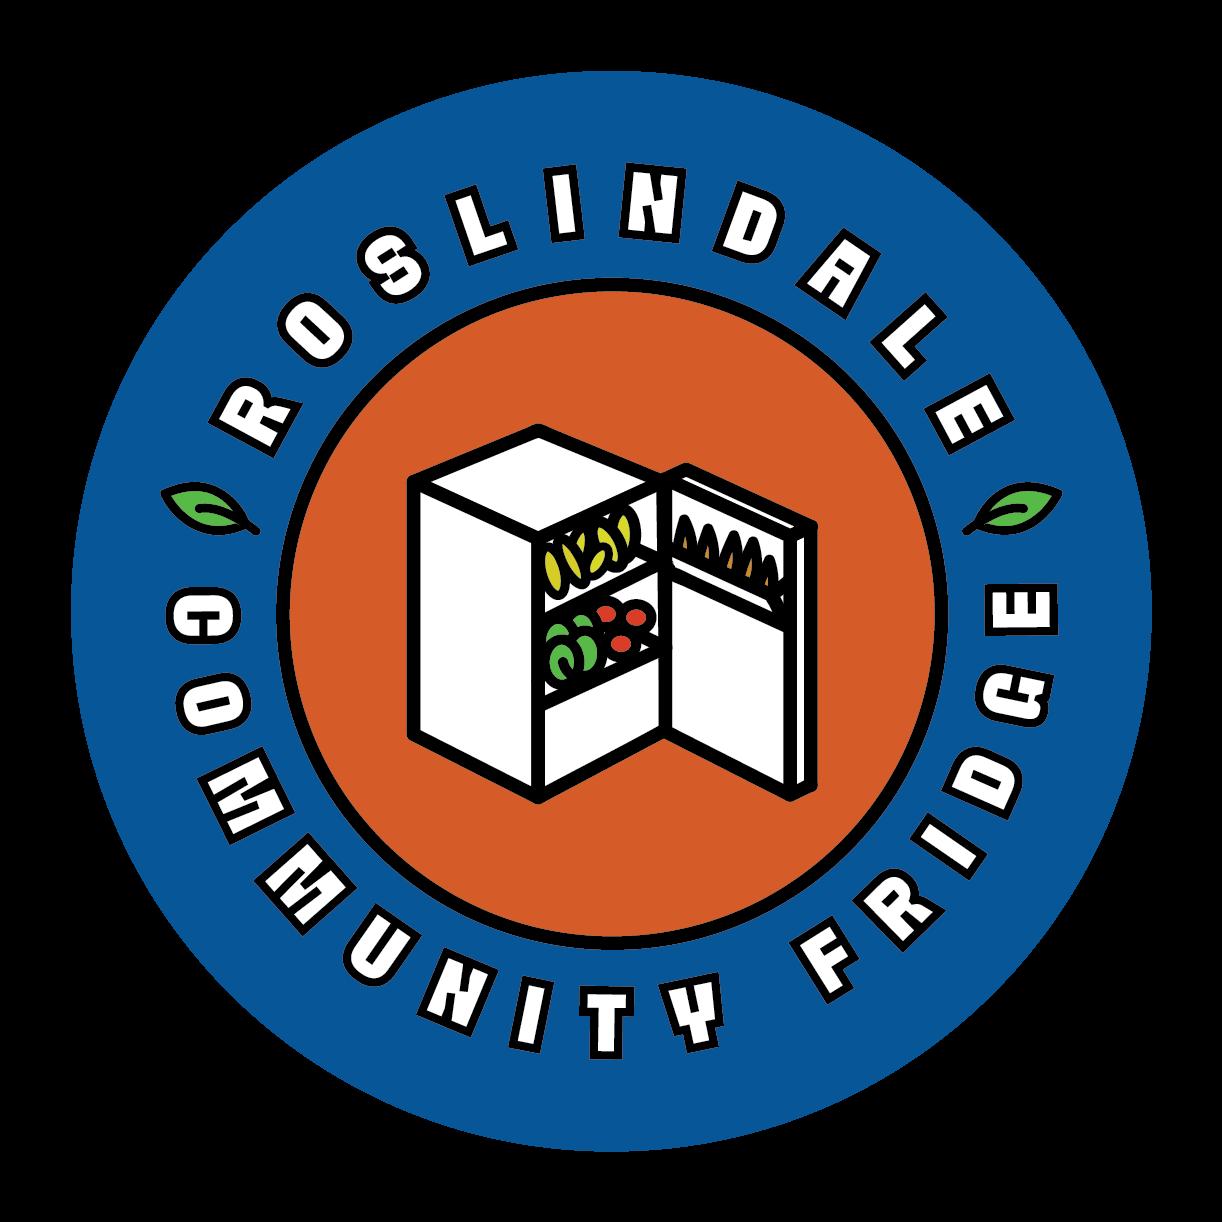 Roslindale Community Fridge (roslindalecommunityfridge) Profile Image | Linktree